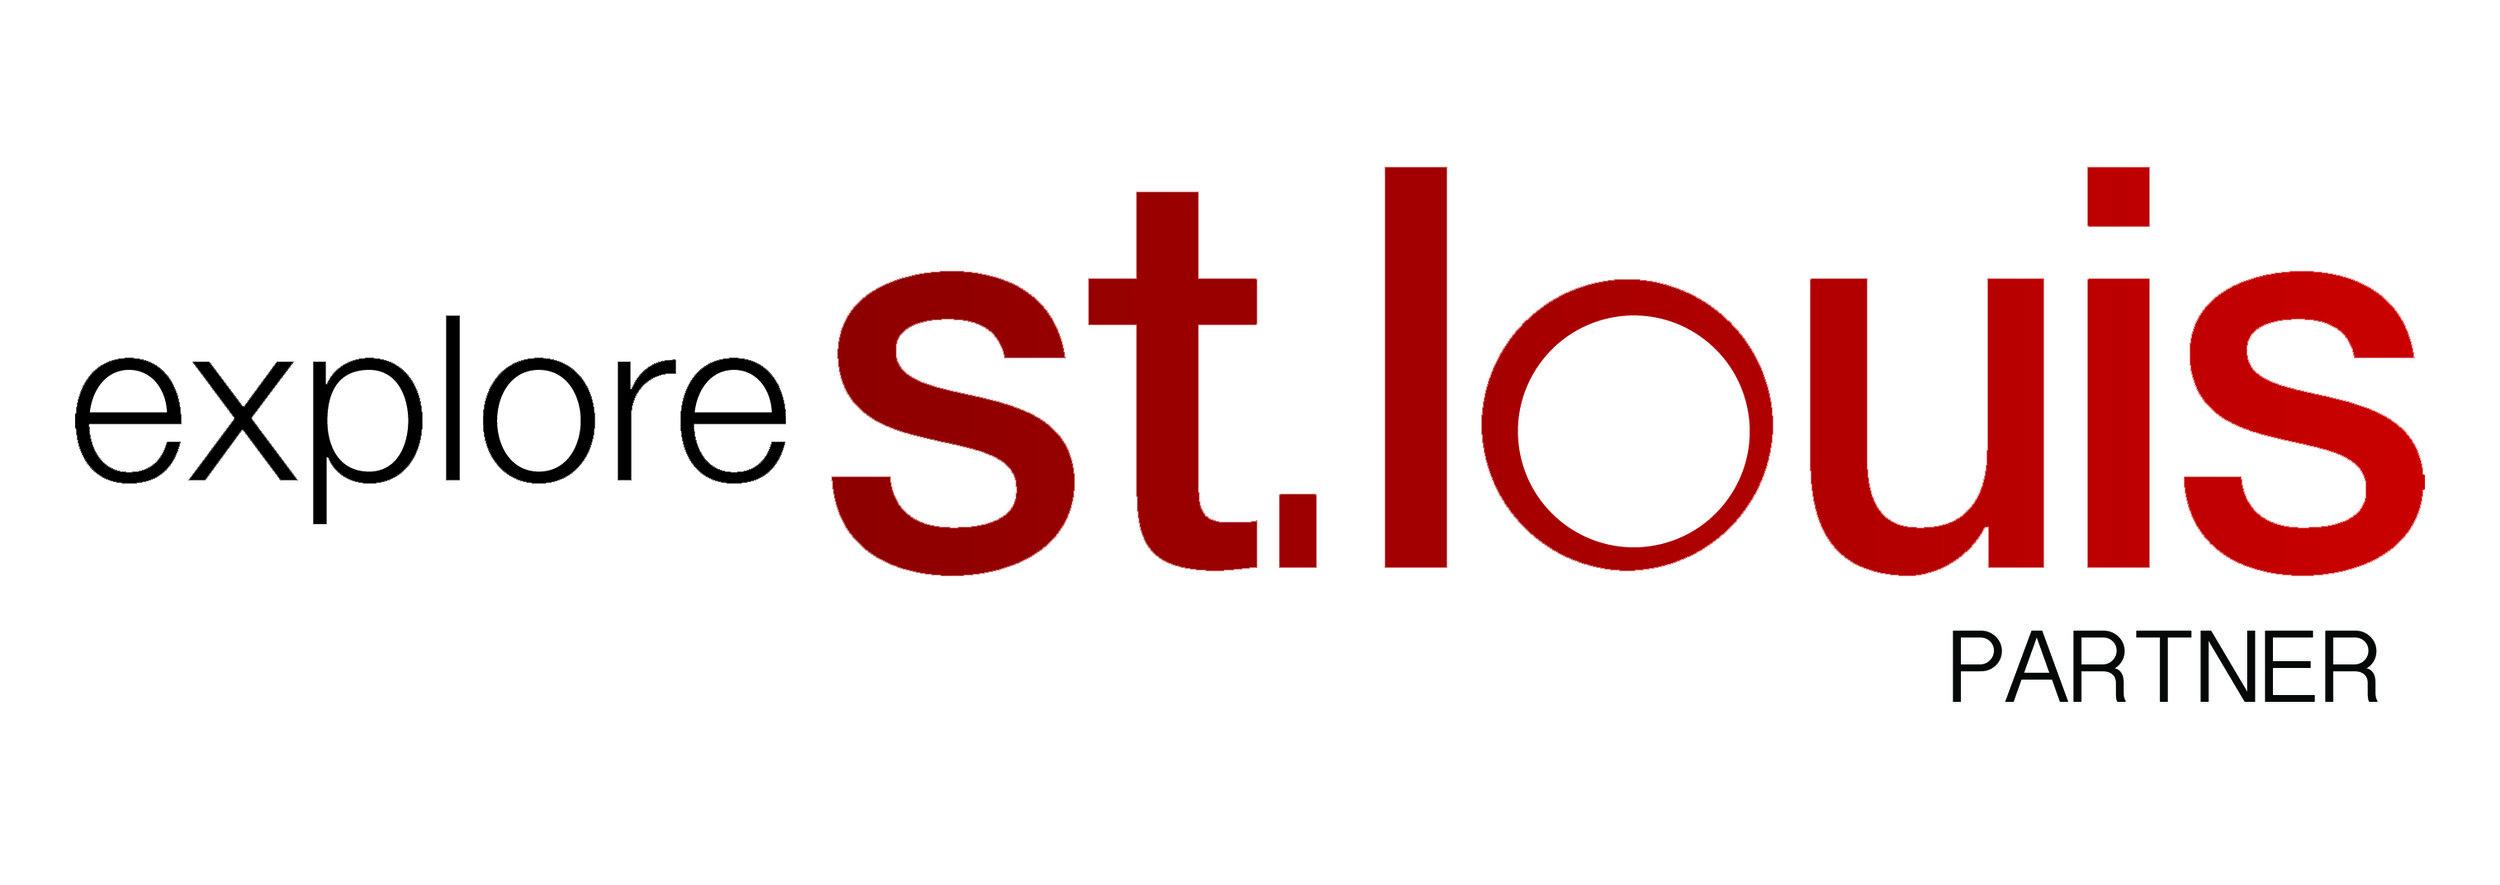 ESTL_logo copy.jpg